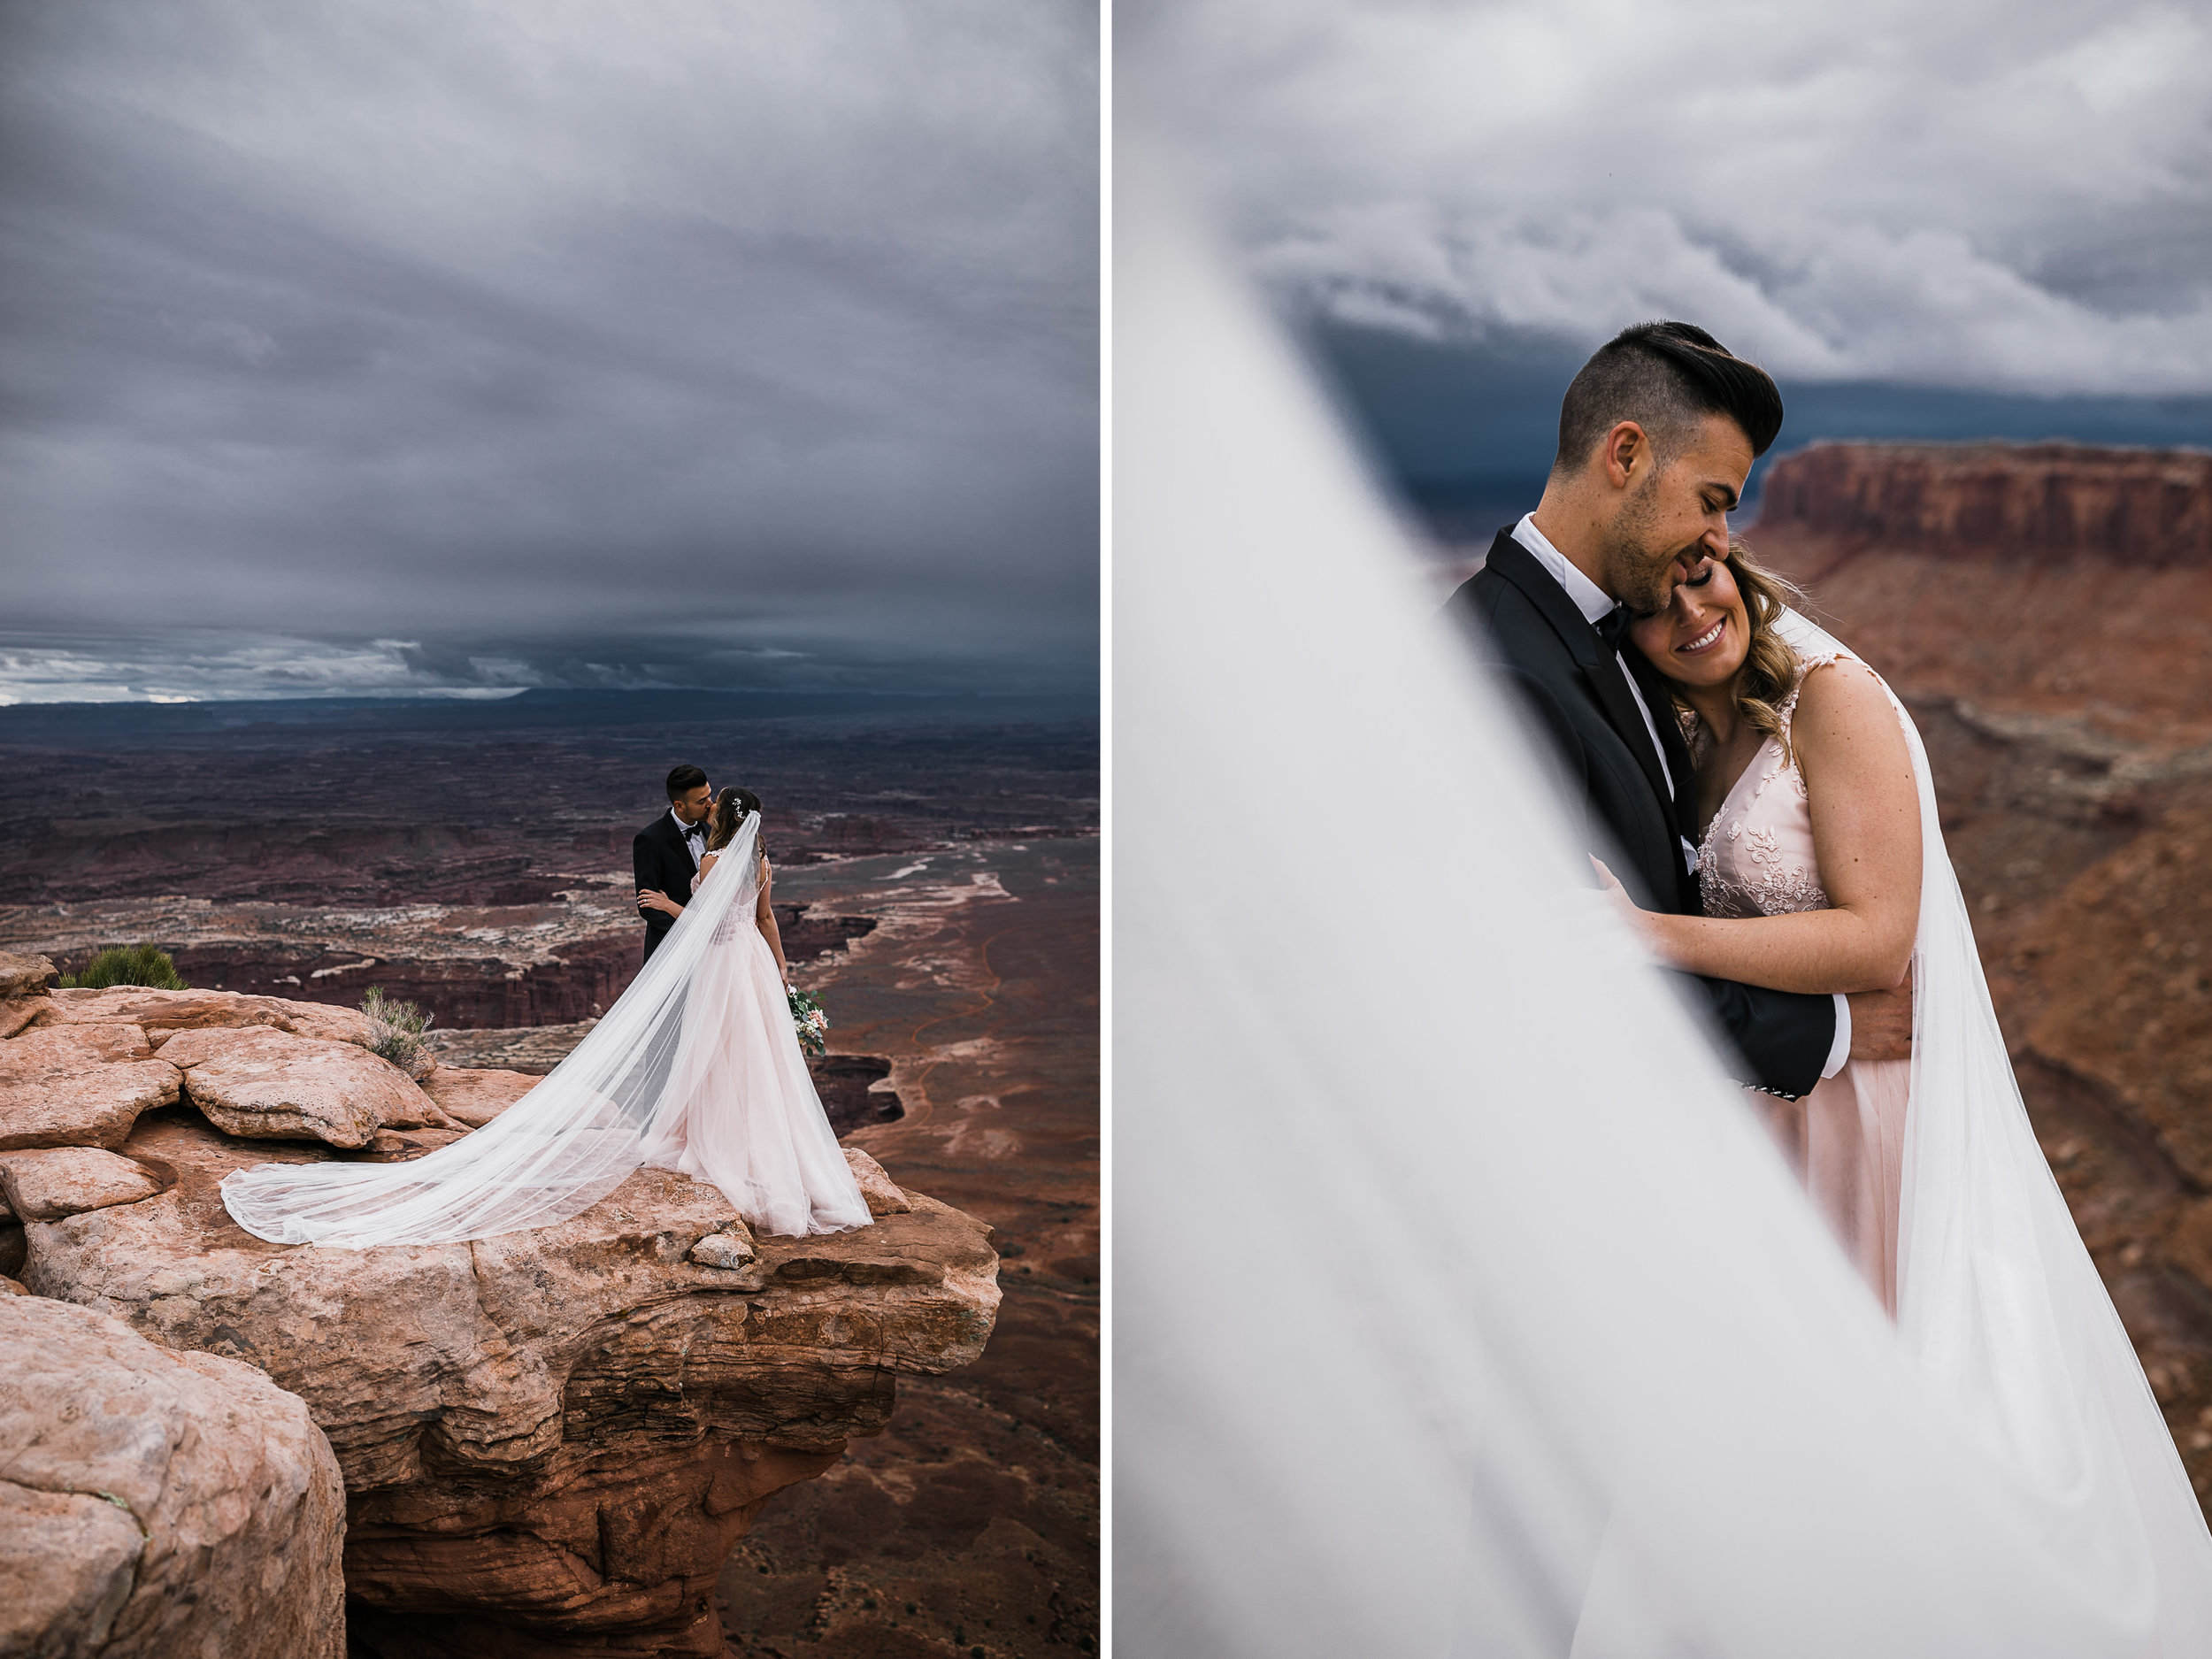 Hearnes-Elopement-Photography-Canyonlands-National-Park-Moab-Wedding-2.jpg